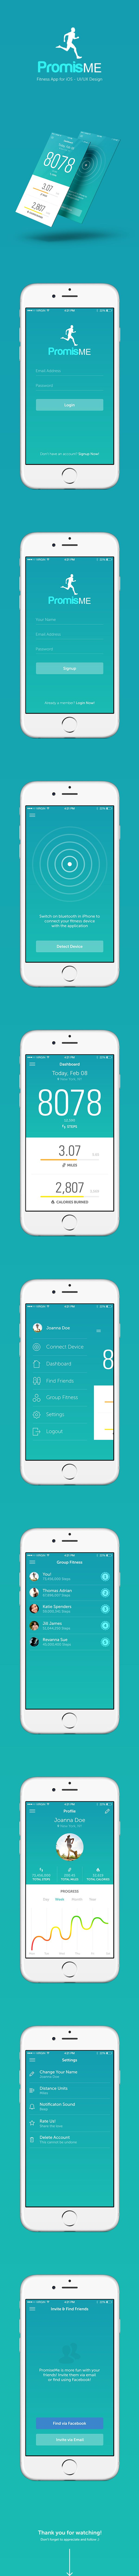 PromiseMe | Fitness App UI Design on Behance